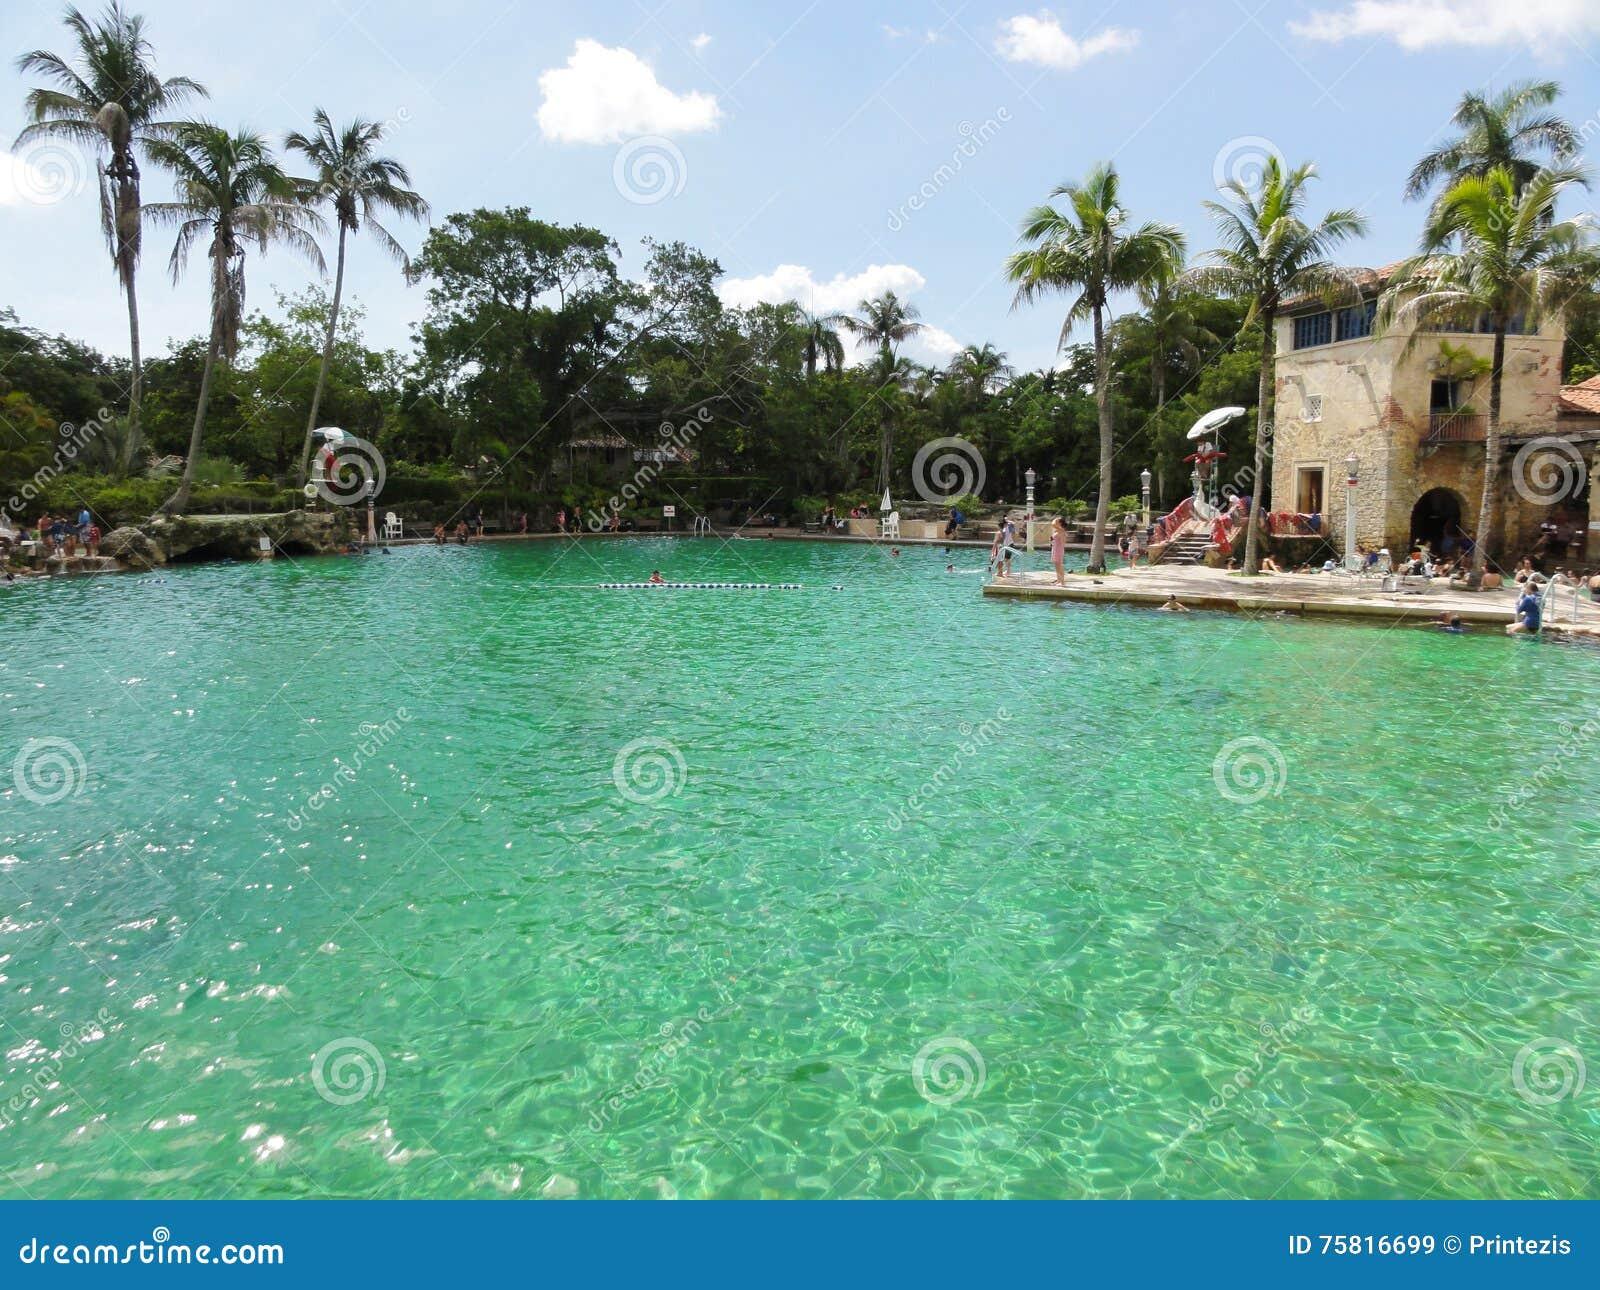 Venetian Pool - Historic Florida - Coral Gables